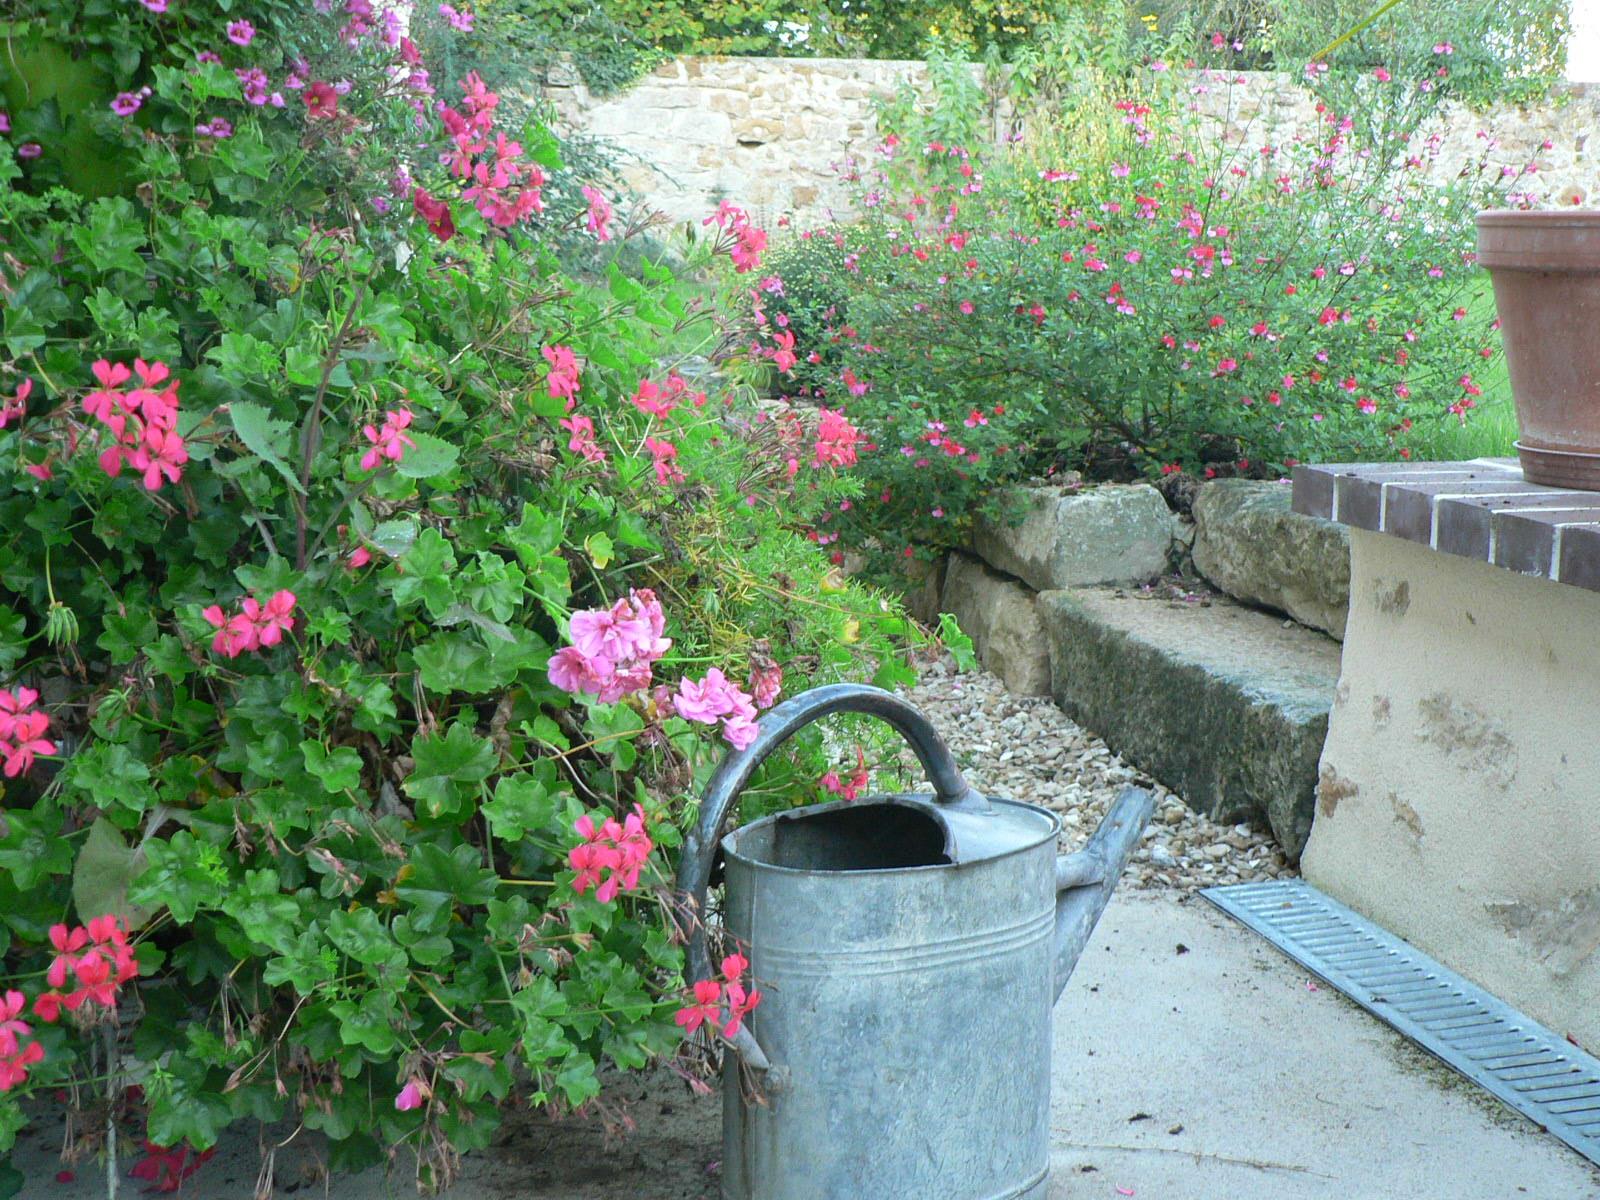 jardin fleuri et clos, animaux acceptés, transats, barbecue, salon ...